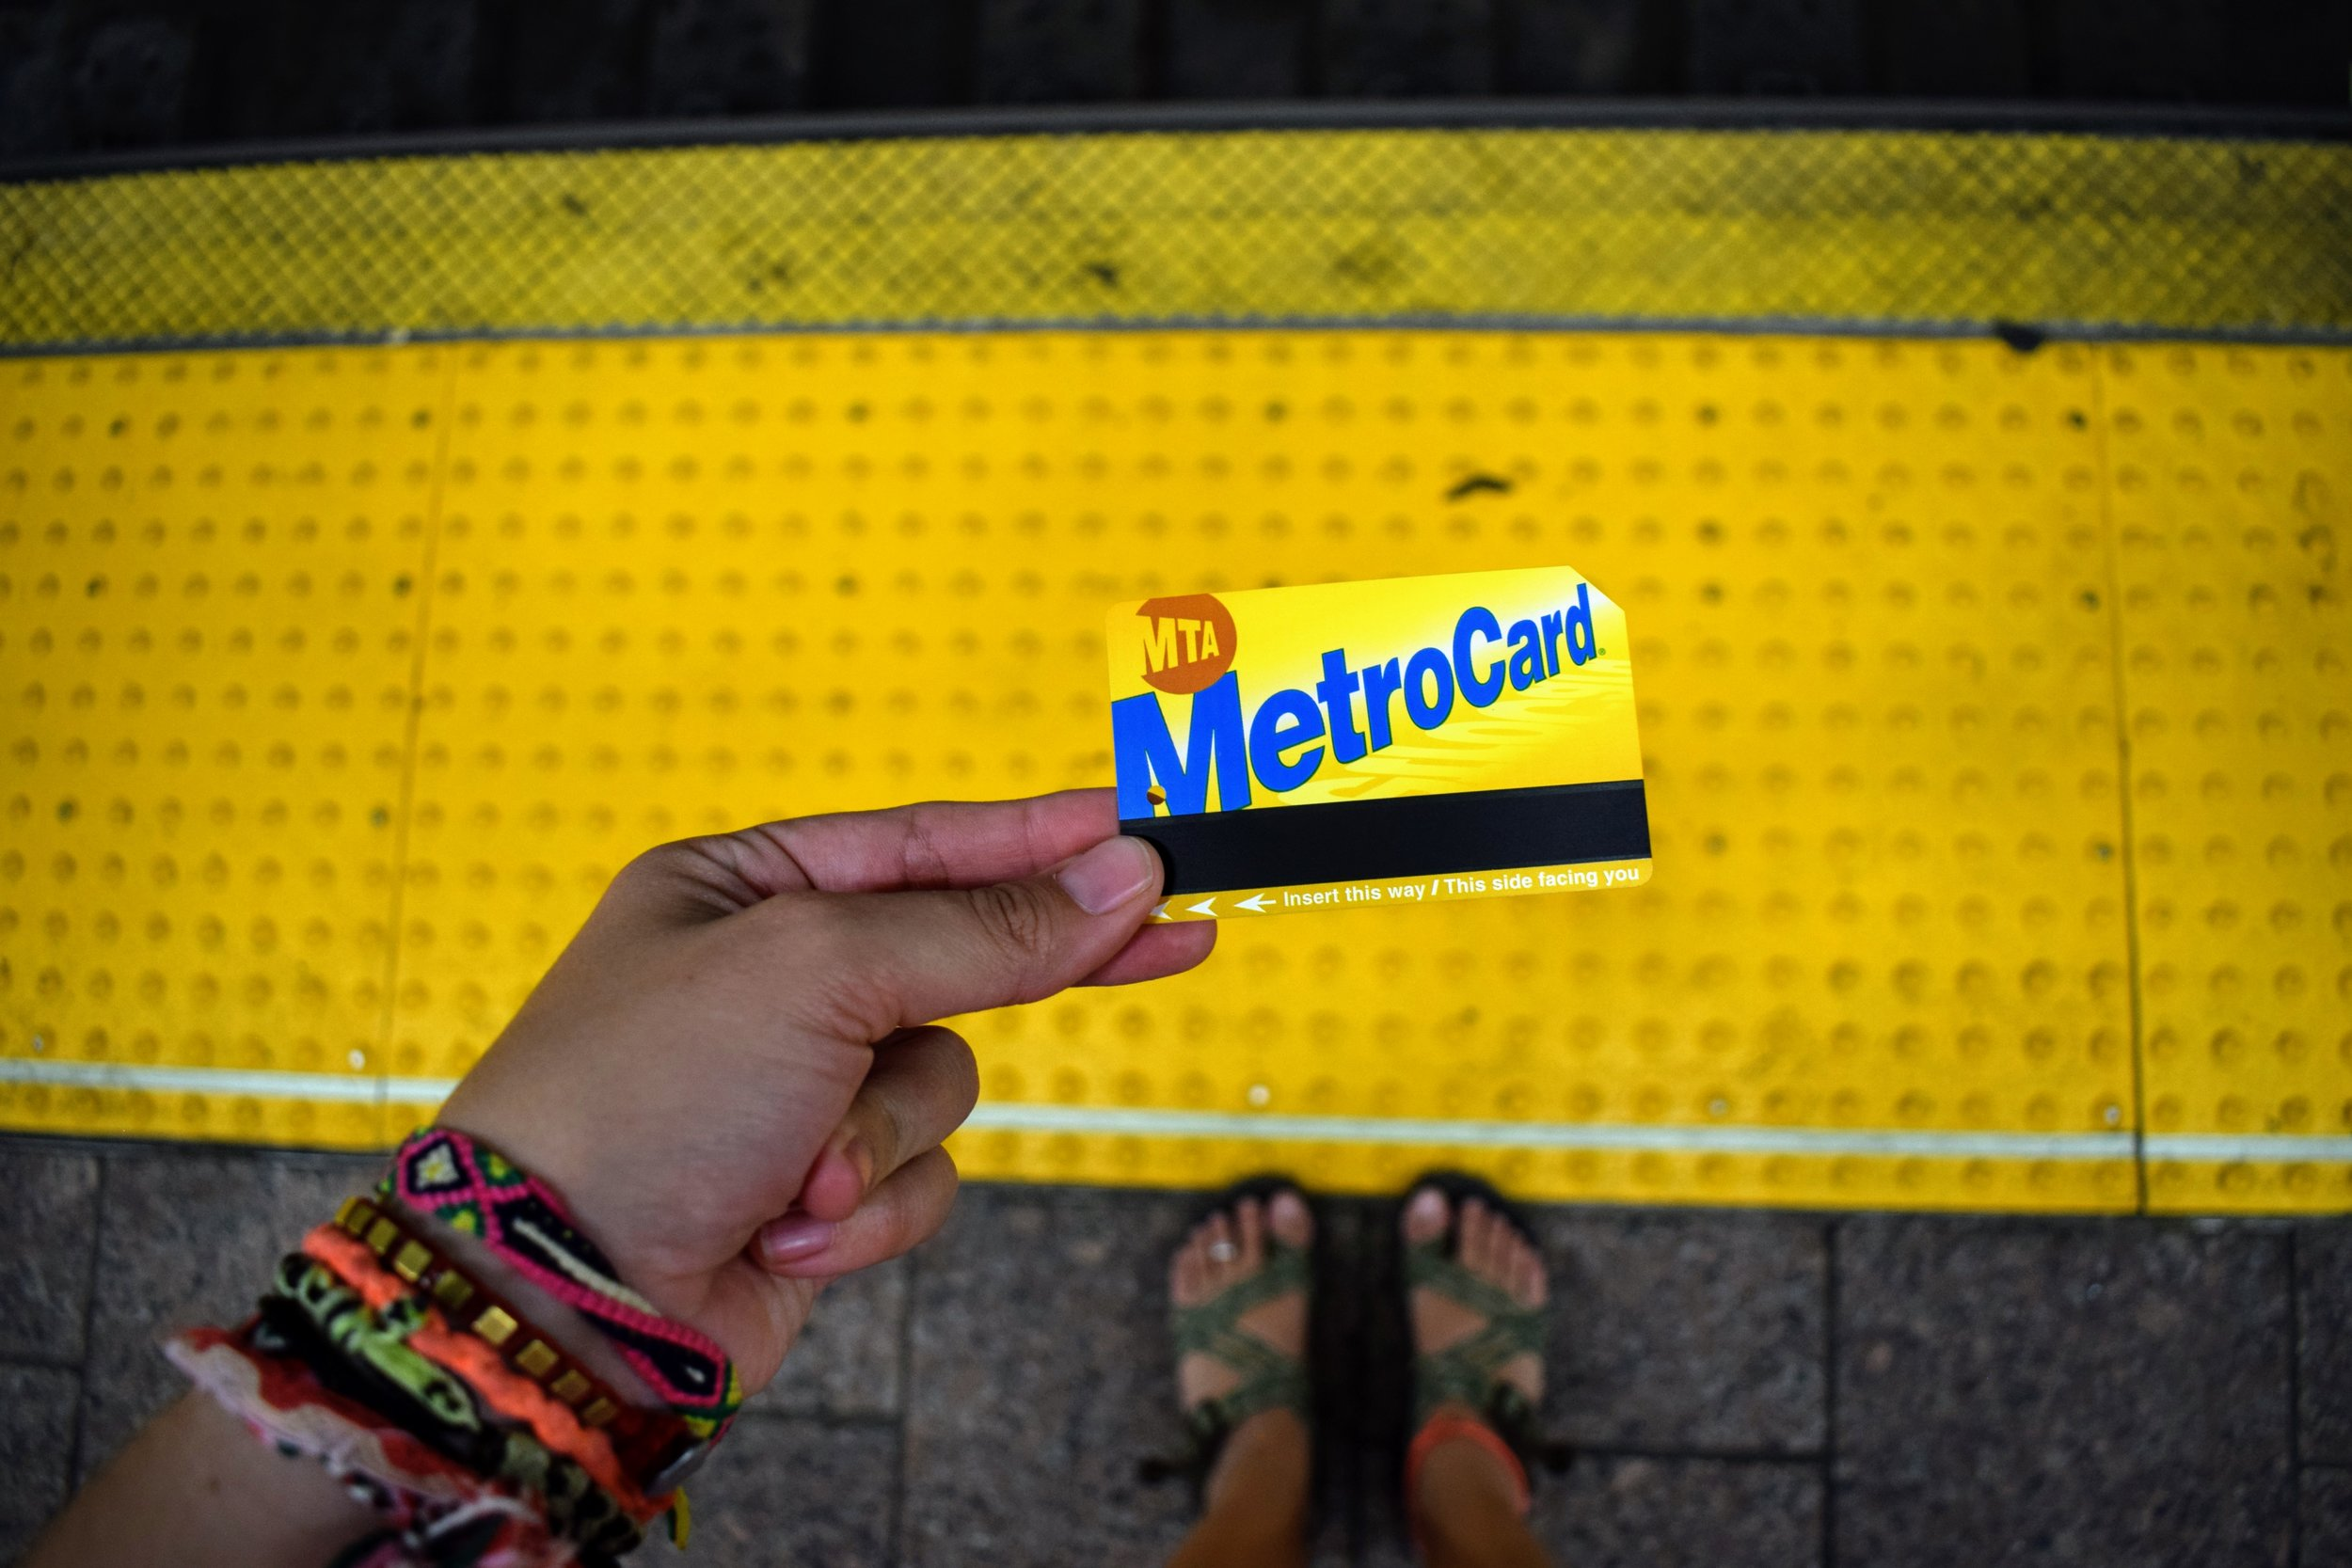 manhattan transit authority card